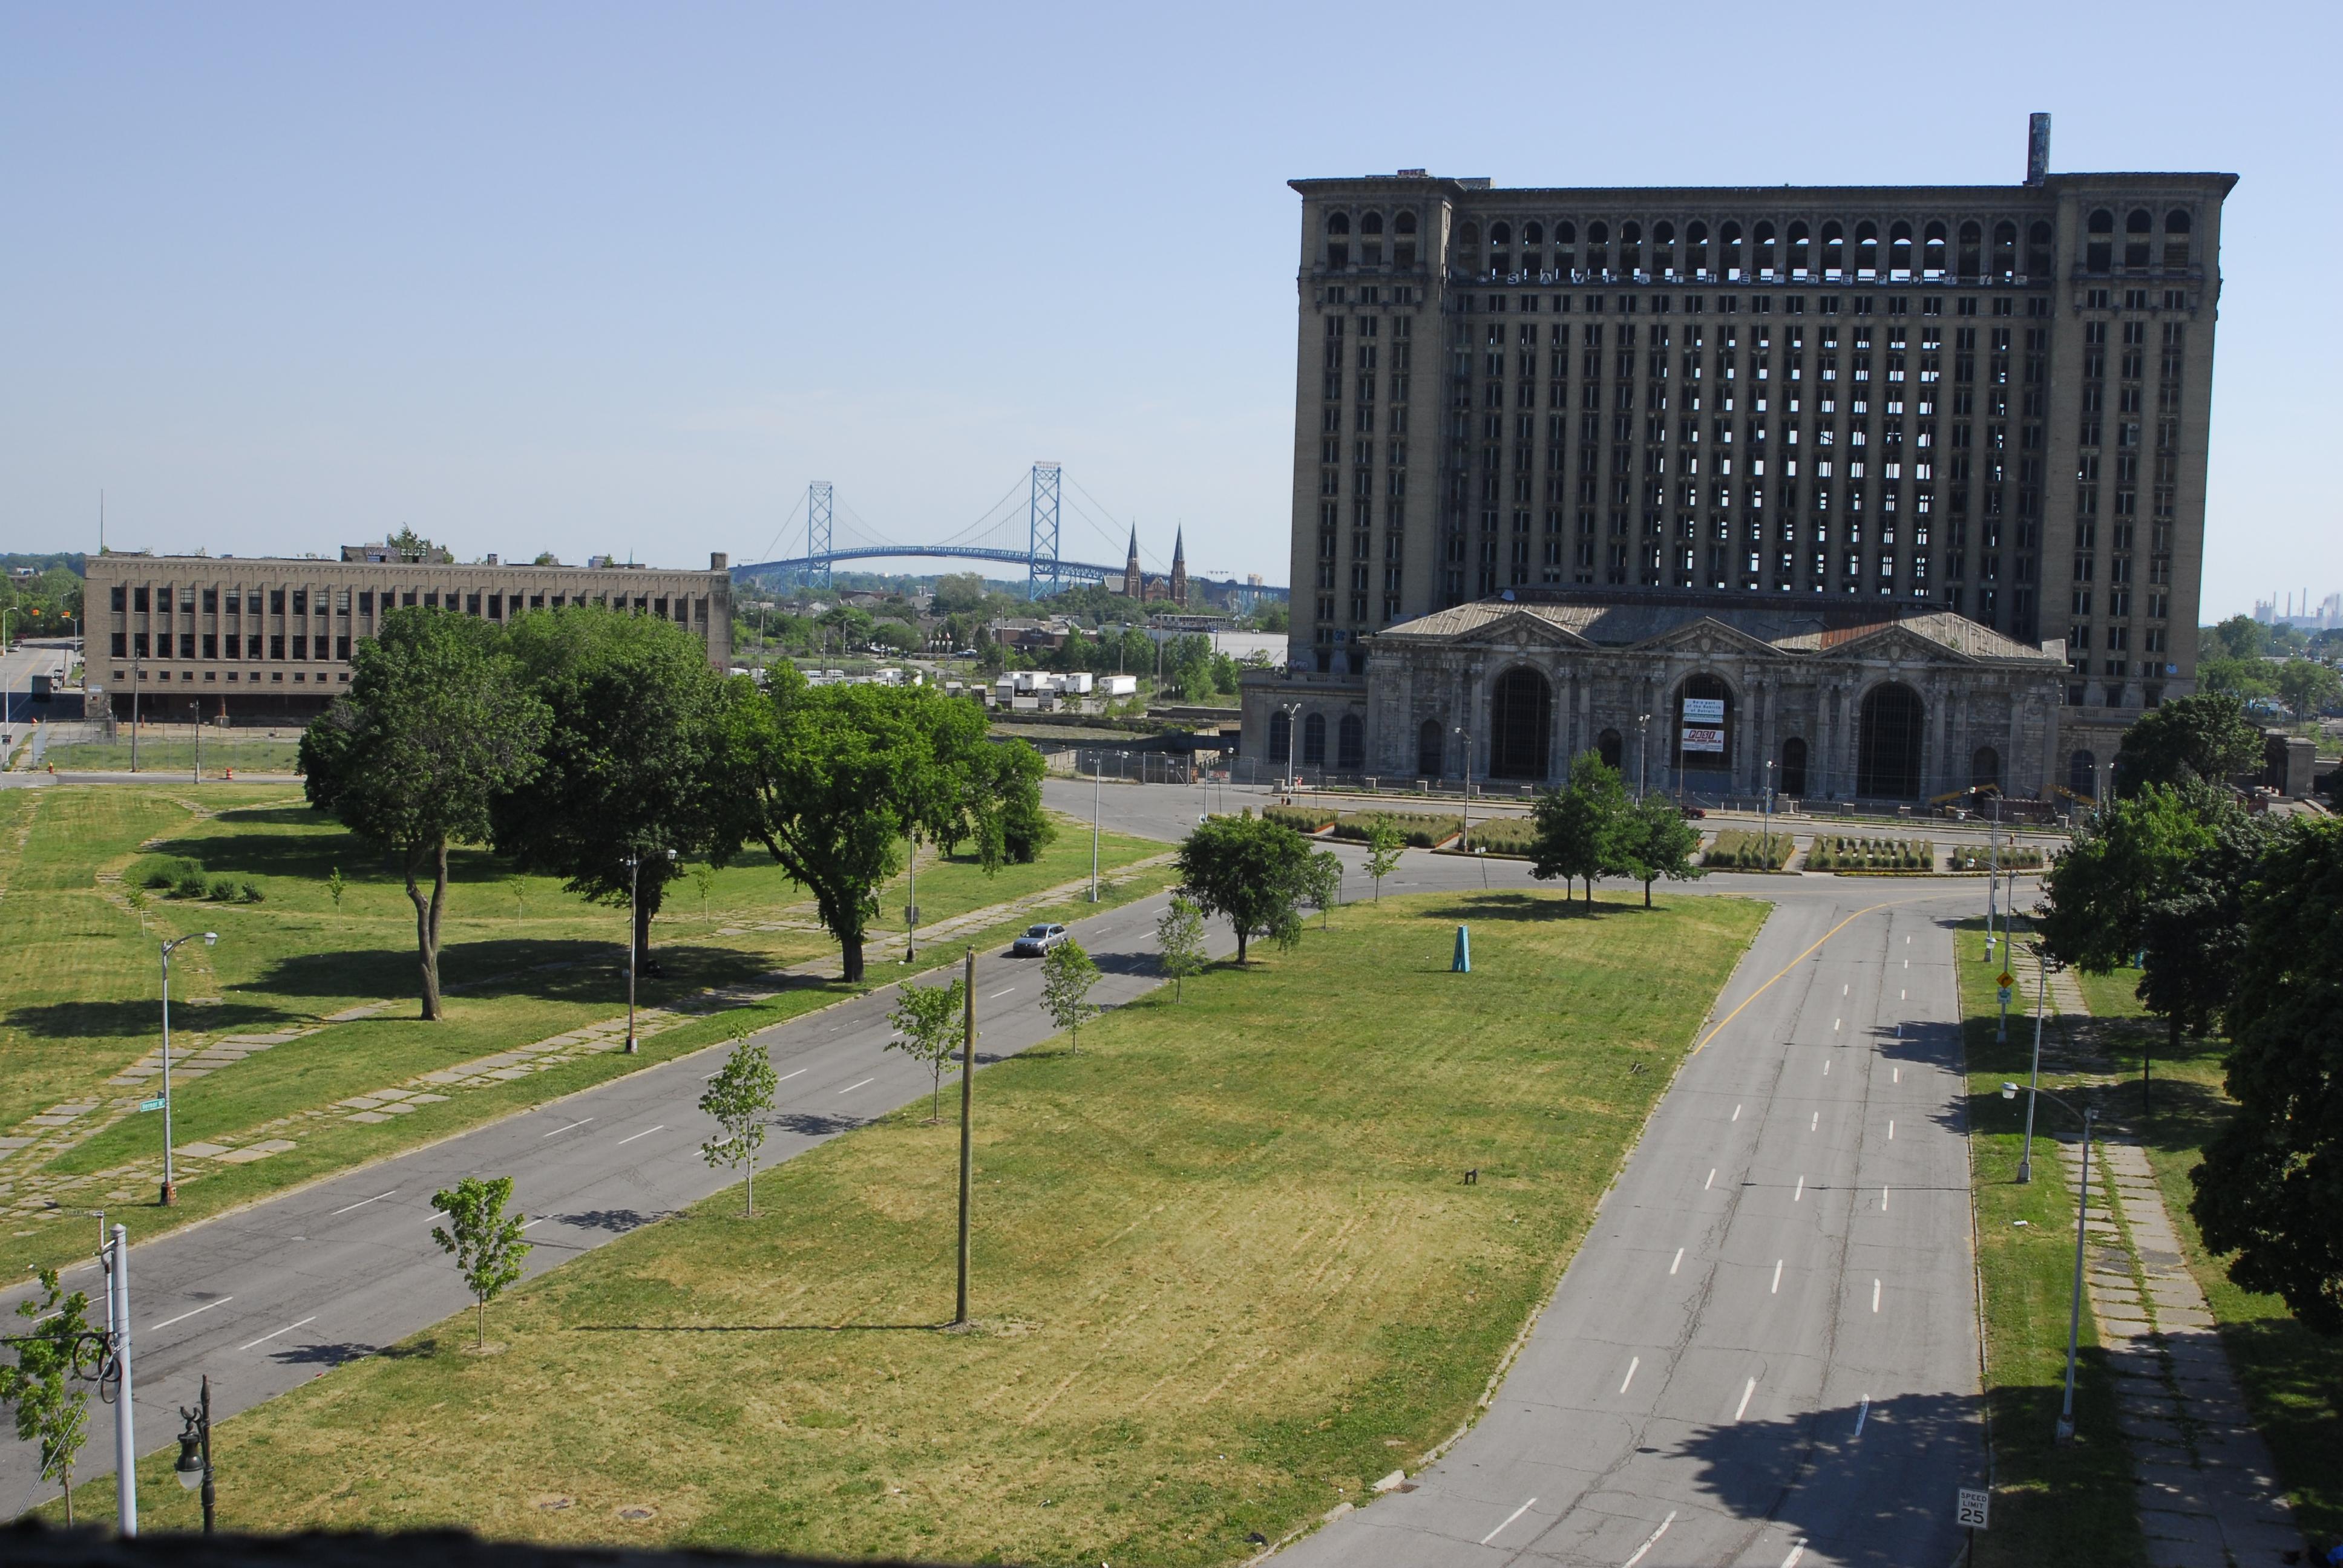 Image Usa Ville >> File:Michigan Central Station - Detroit, Michigan, U.S. (10 June 2012).jpg - Wikimedia Commons